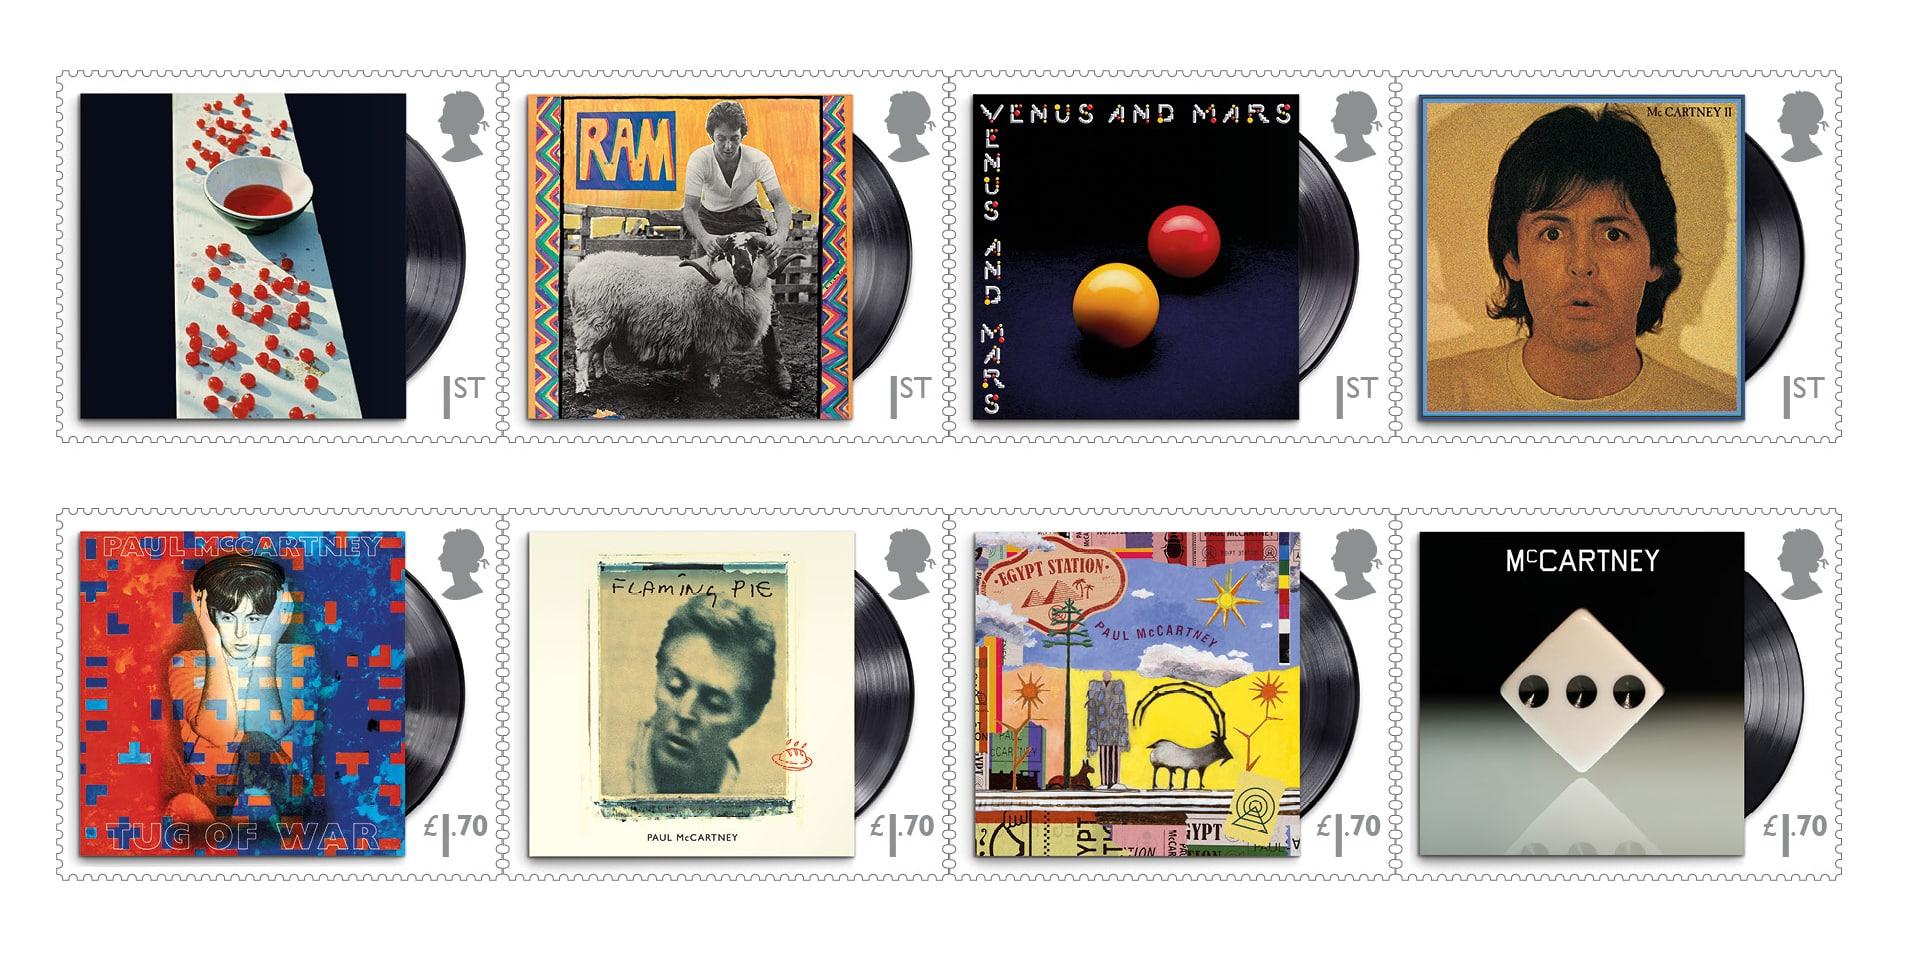 Paul-McCartney-stamps